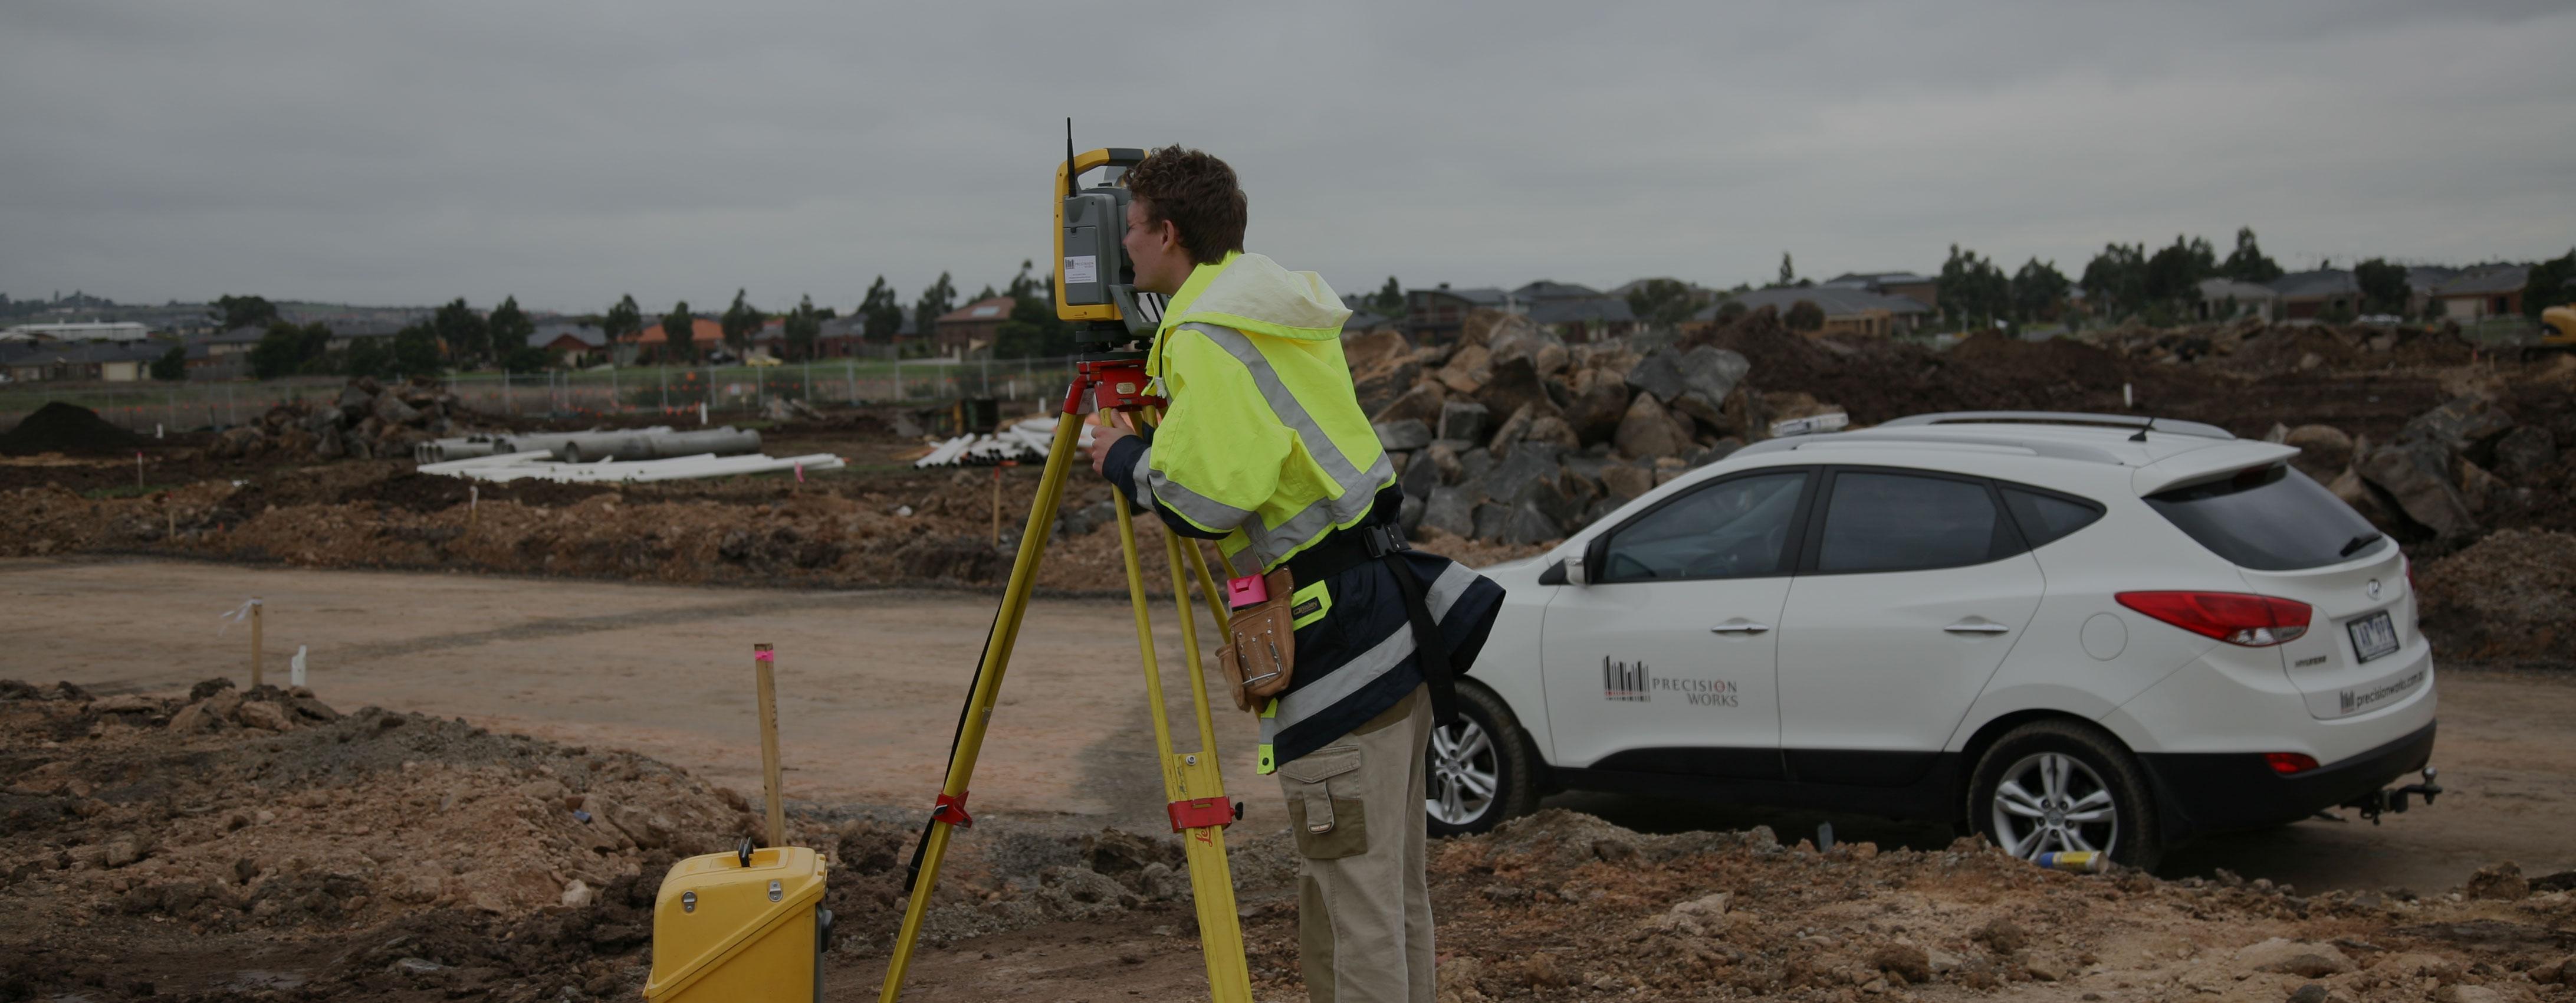 Precision Works Land Surverying Land Surveyors In